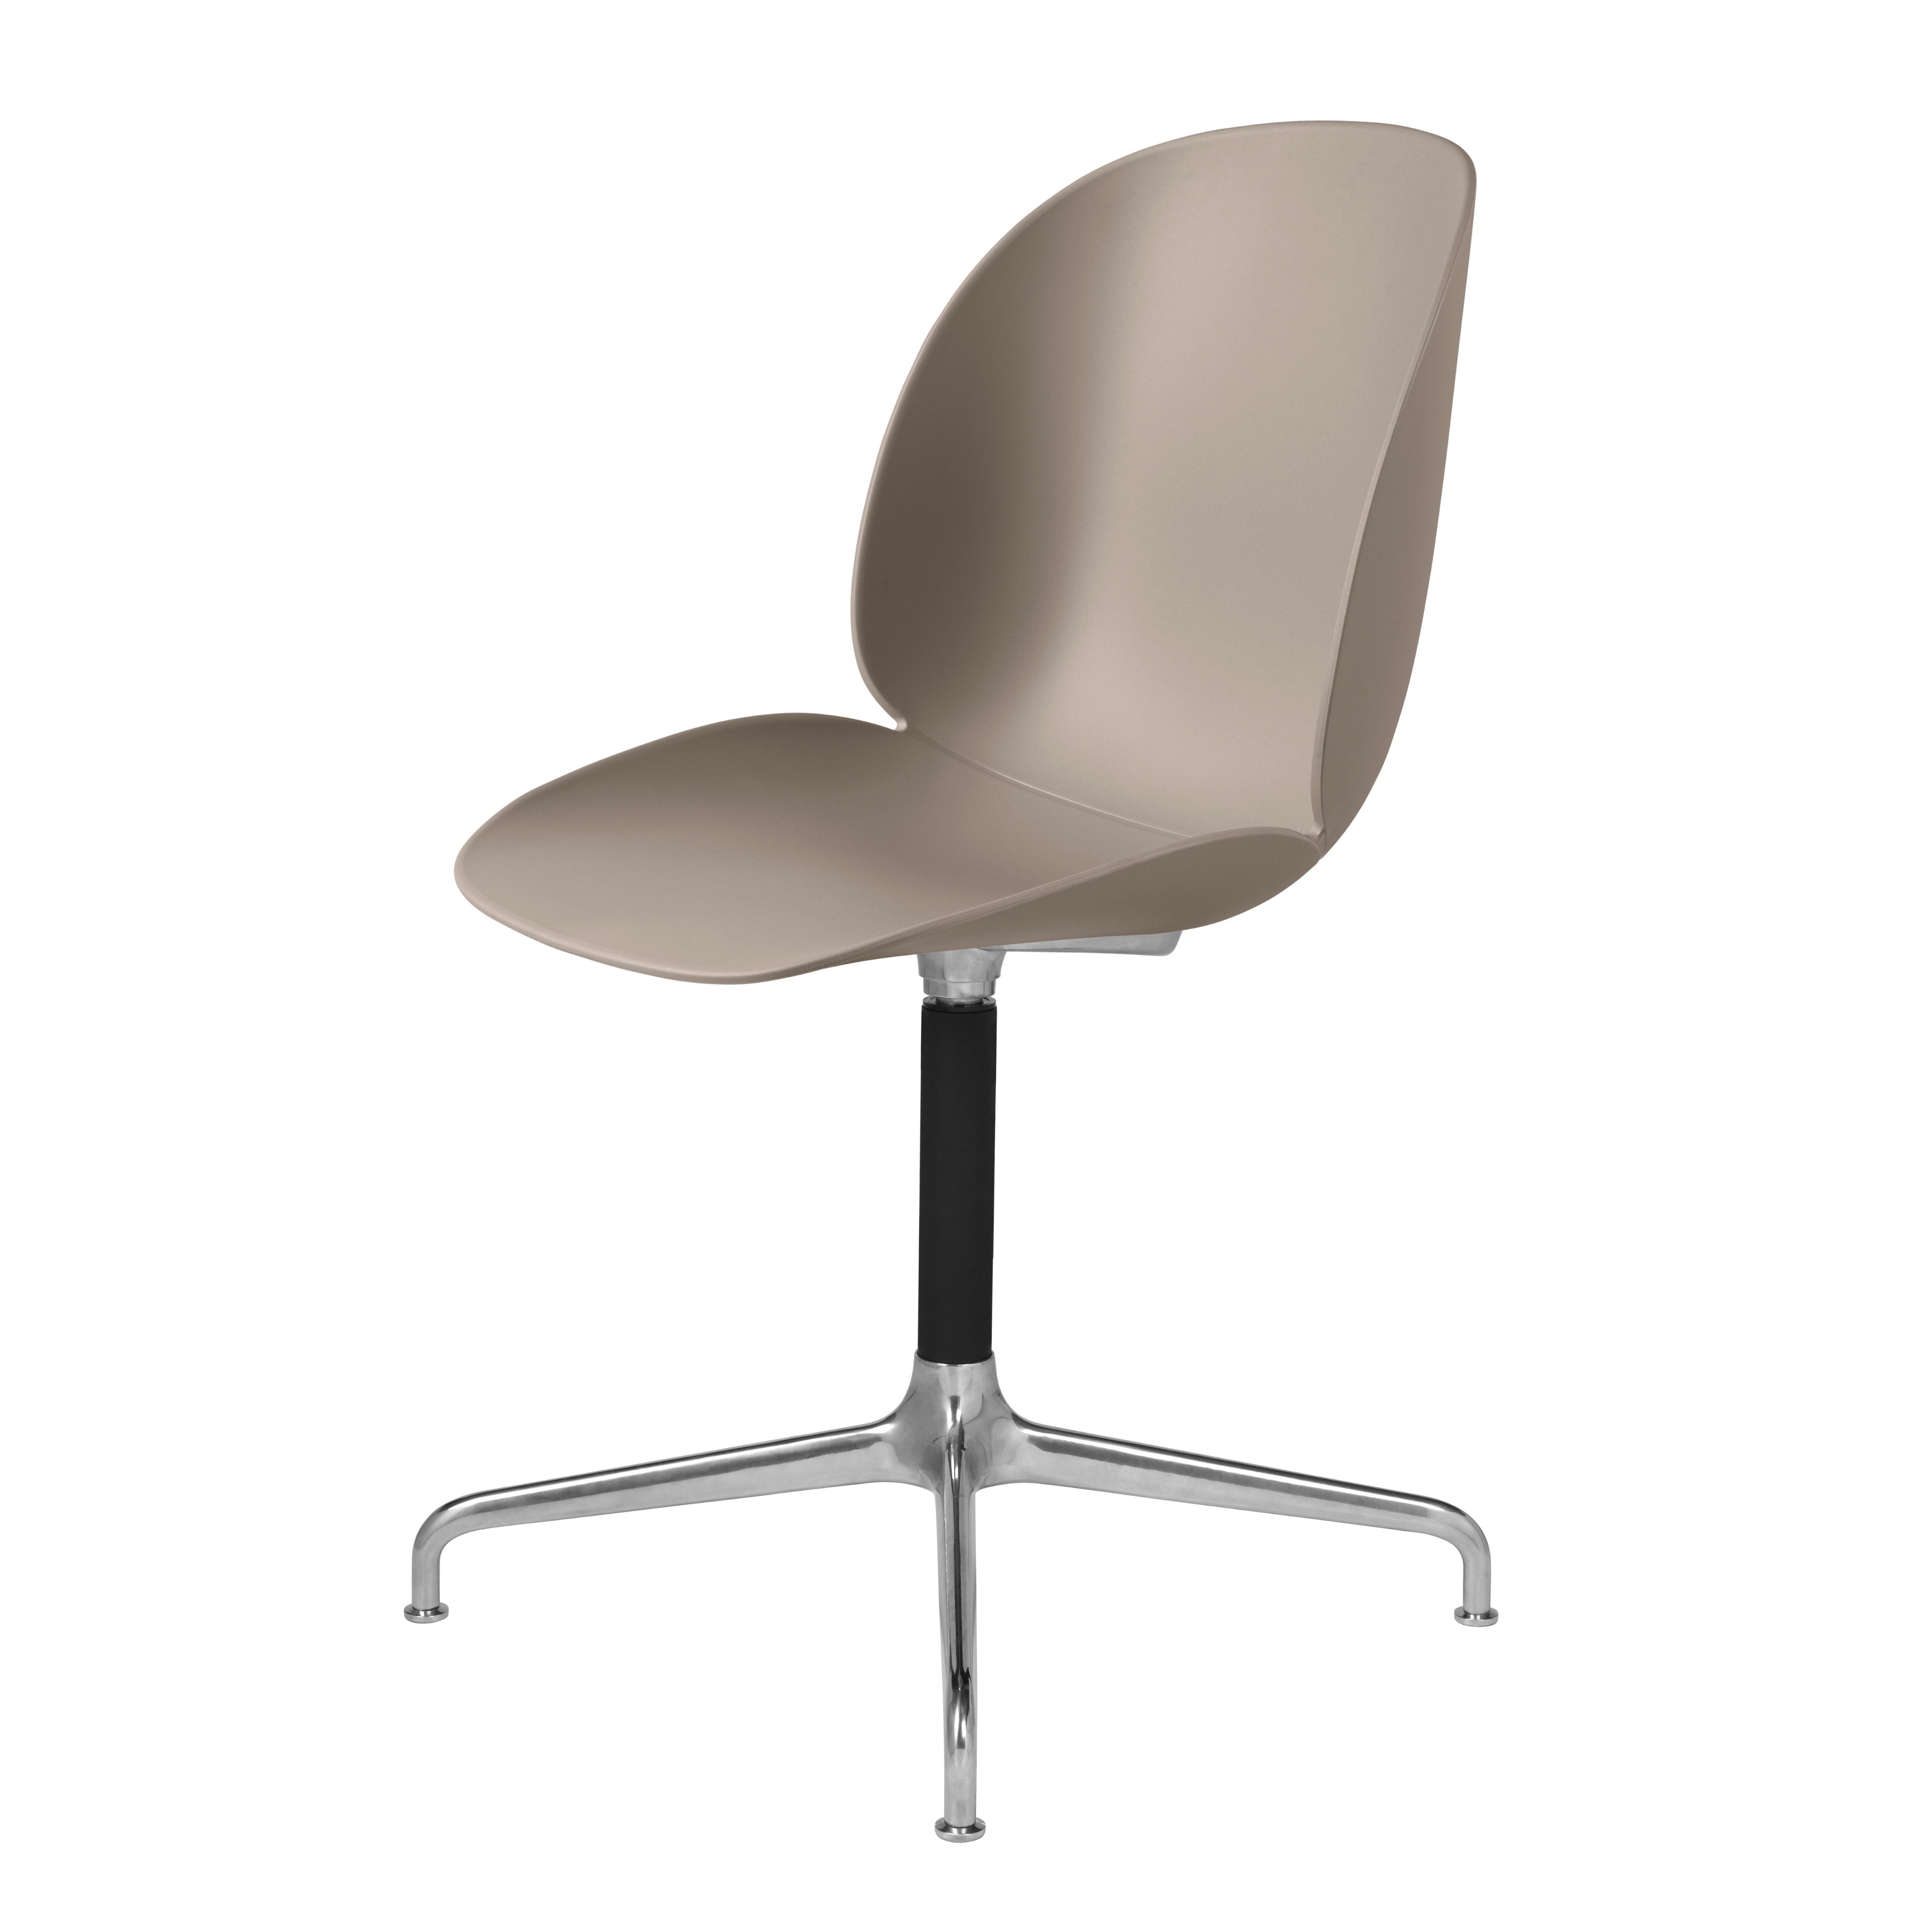 chaise de bureau beetle unupholstered casted swivel base. Black Bedroom Furniture Sets. Home Design Ideas